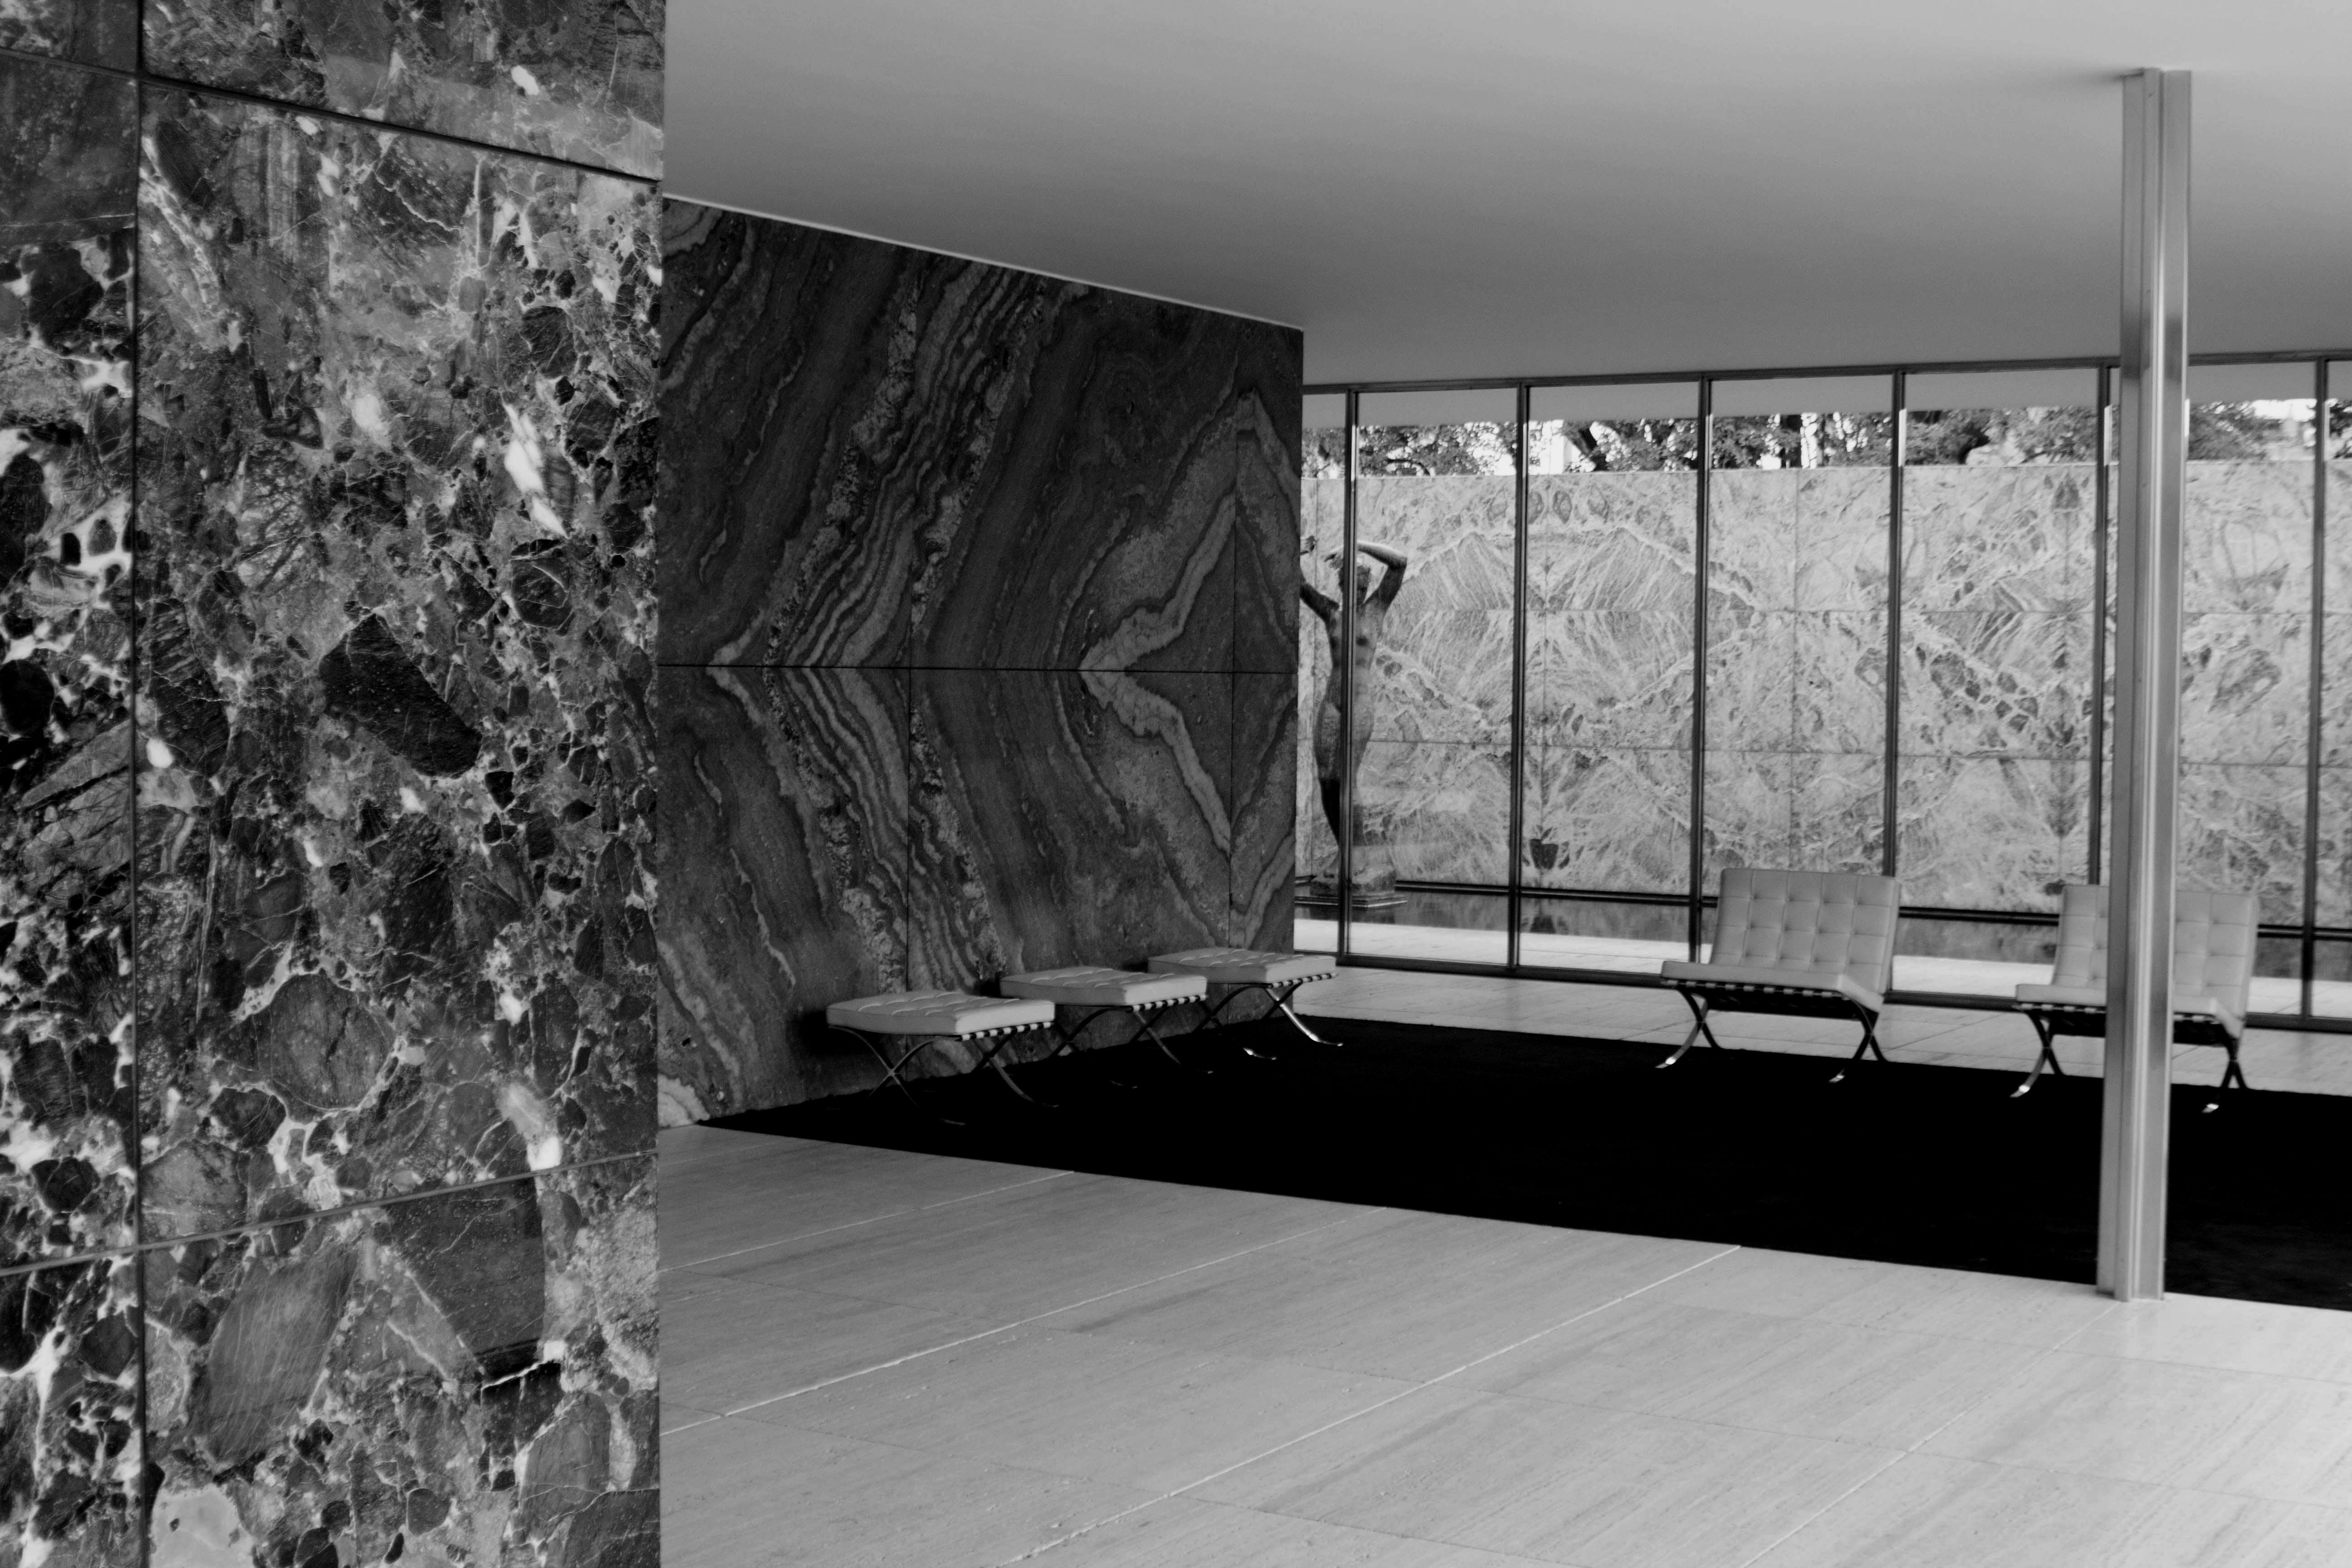 María Jesús Mora_ Arquitecto_ Fotógrafo_Alicante_ Pabellón de Mies en Barcelona 31